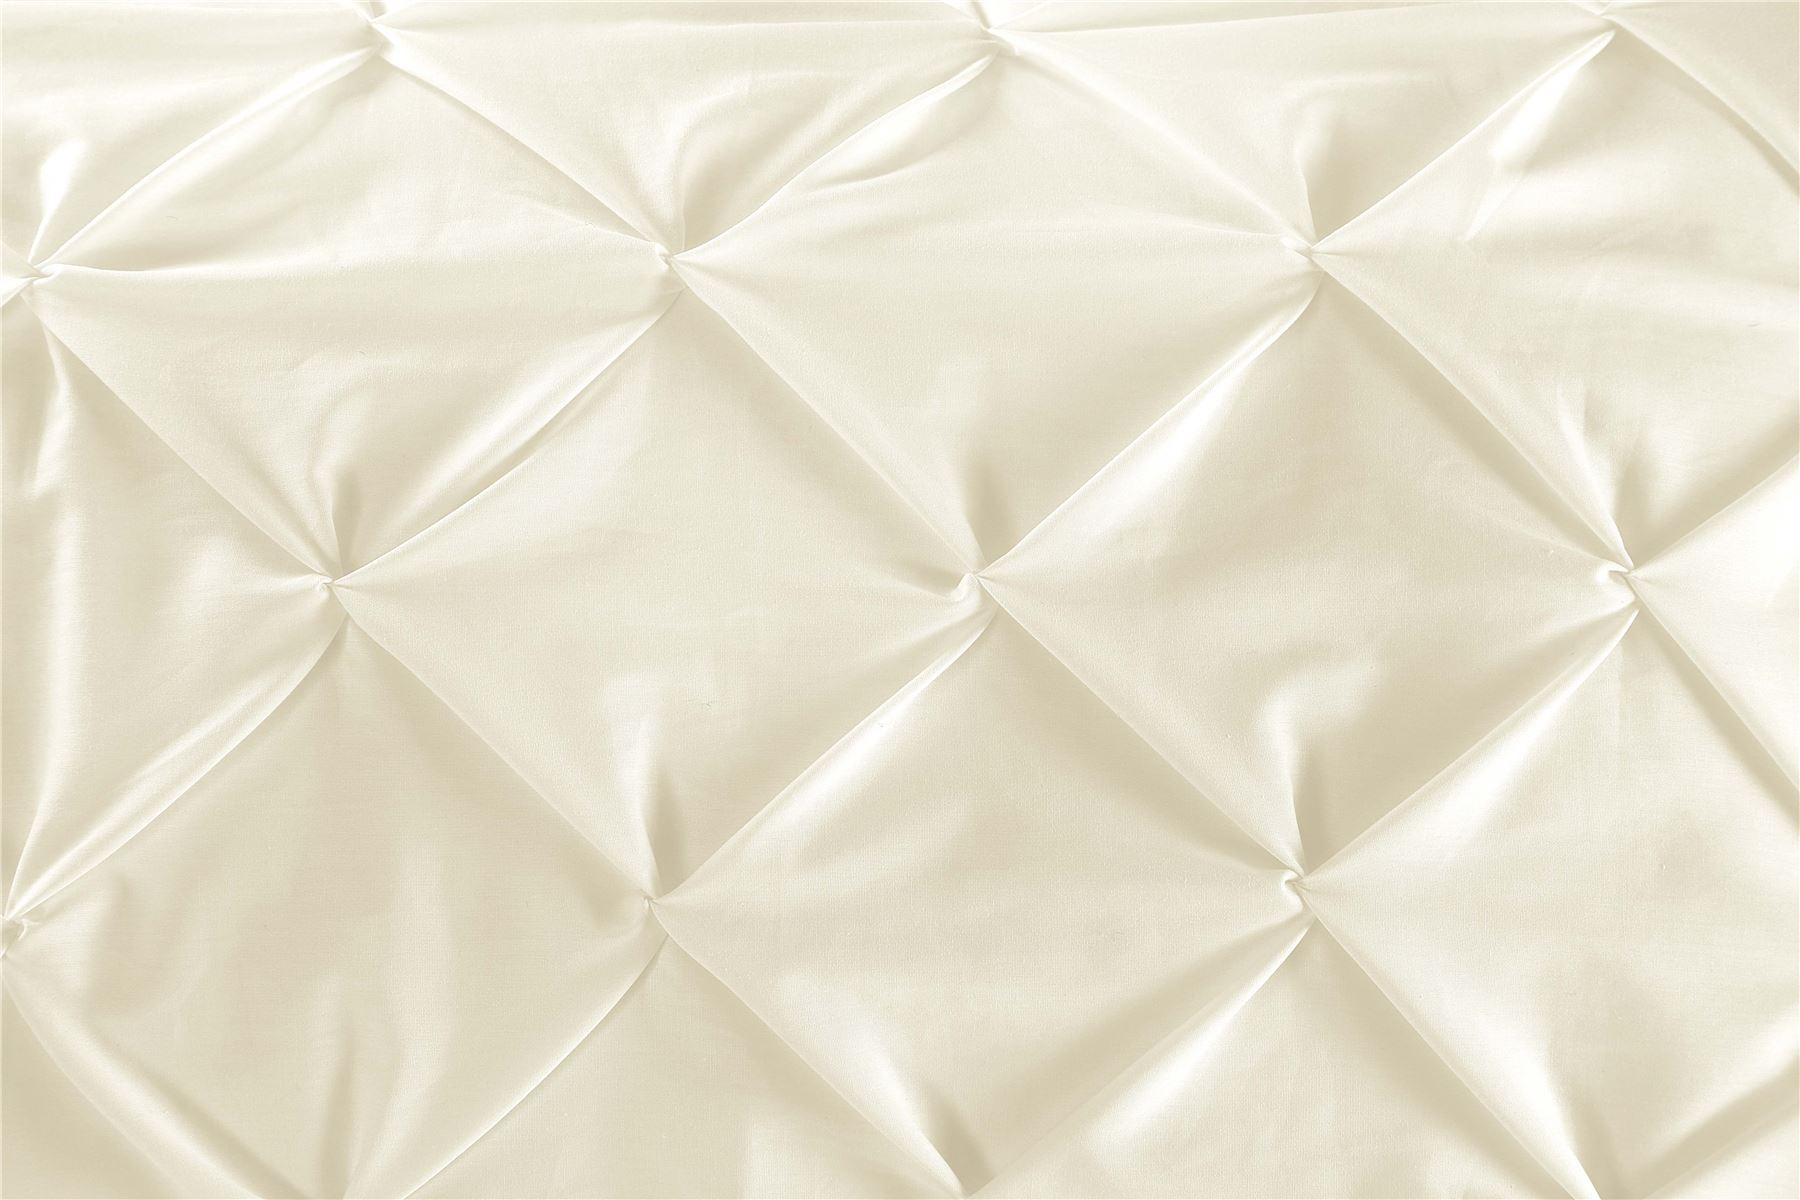 Luxury-Pure-100-Cotton-200-Thread-Pinch-Pleat-Pintuck-Puckering-Duvet-Cover-Set thumbnail 11